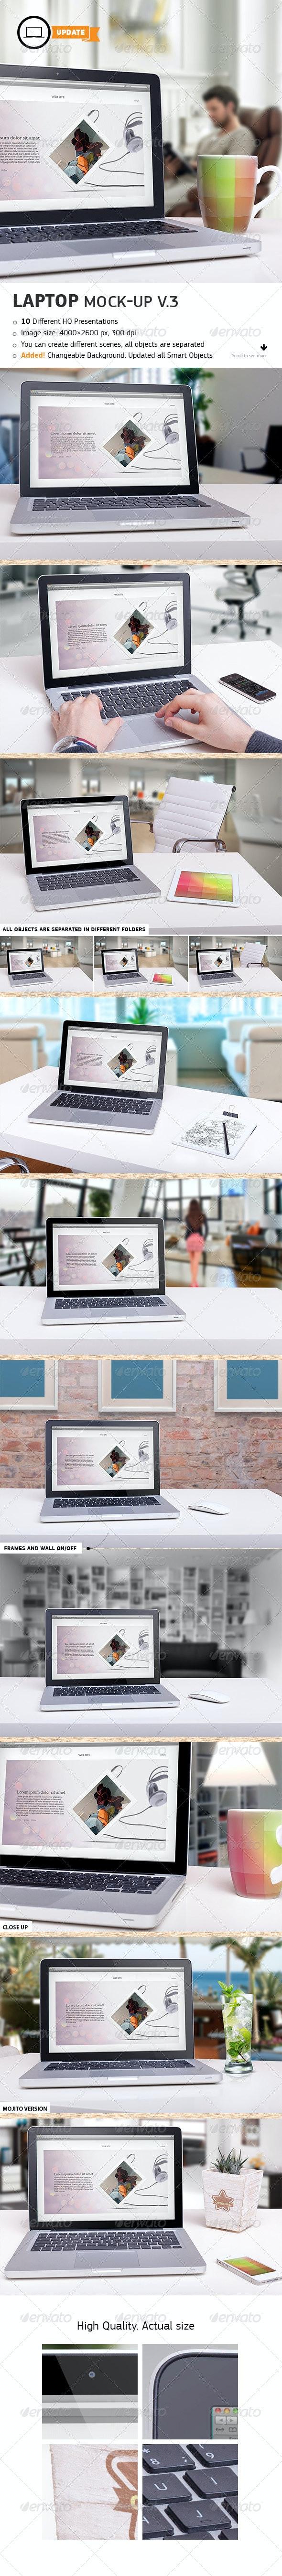 10 Laptop Mock-ups Vol.3 - Laptop Displays